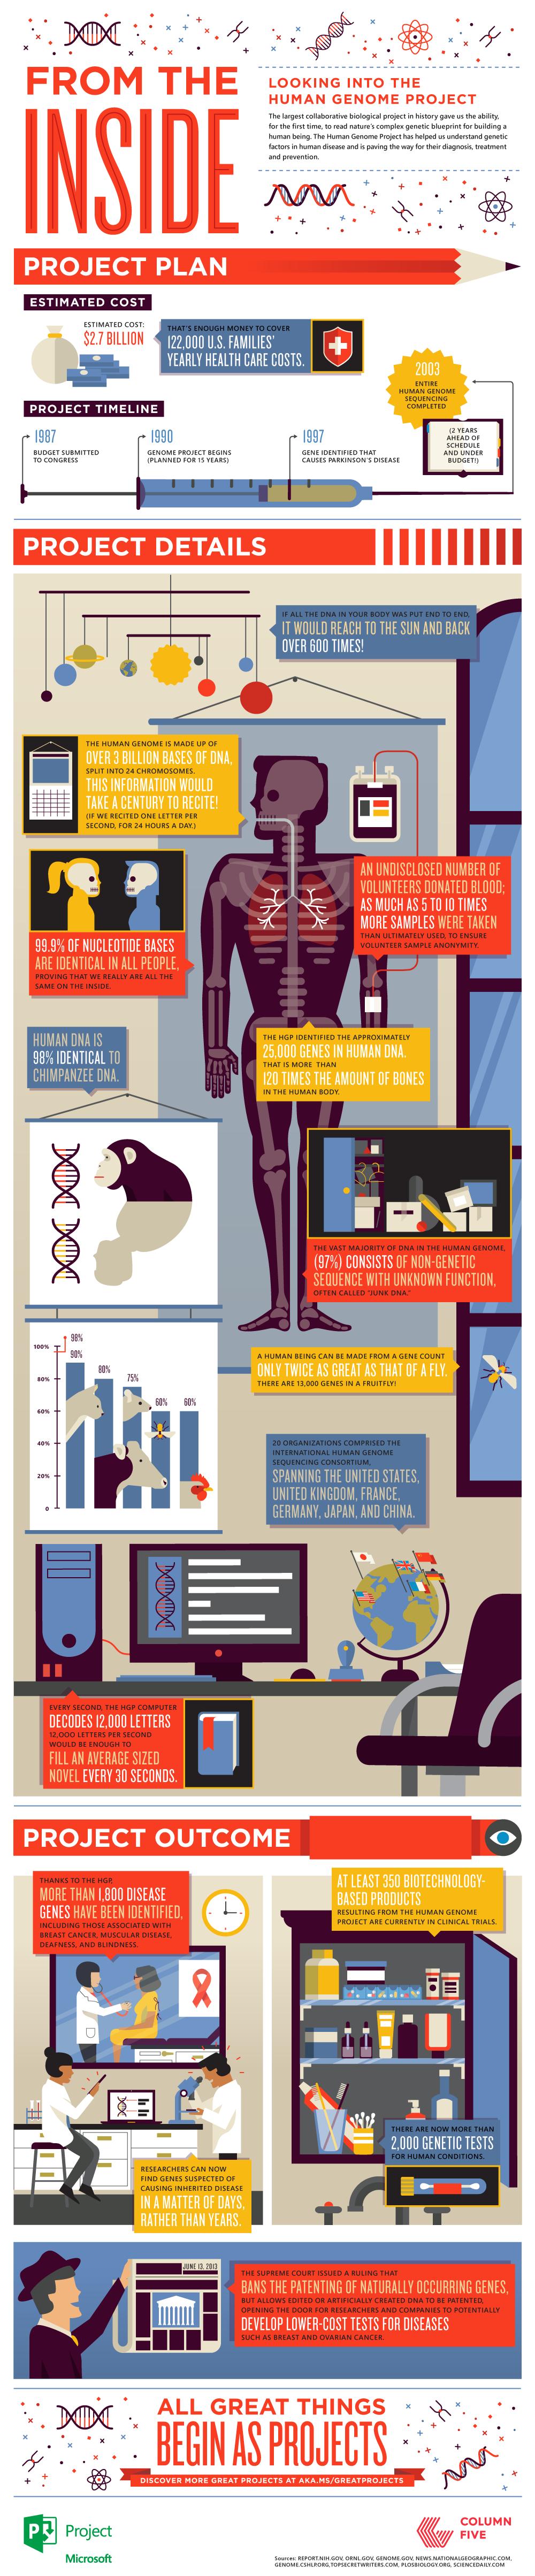 Biology essay genes and genomes?